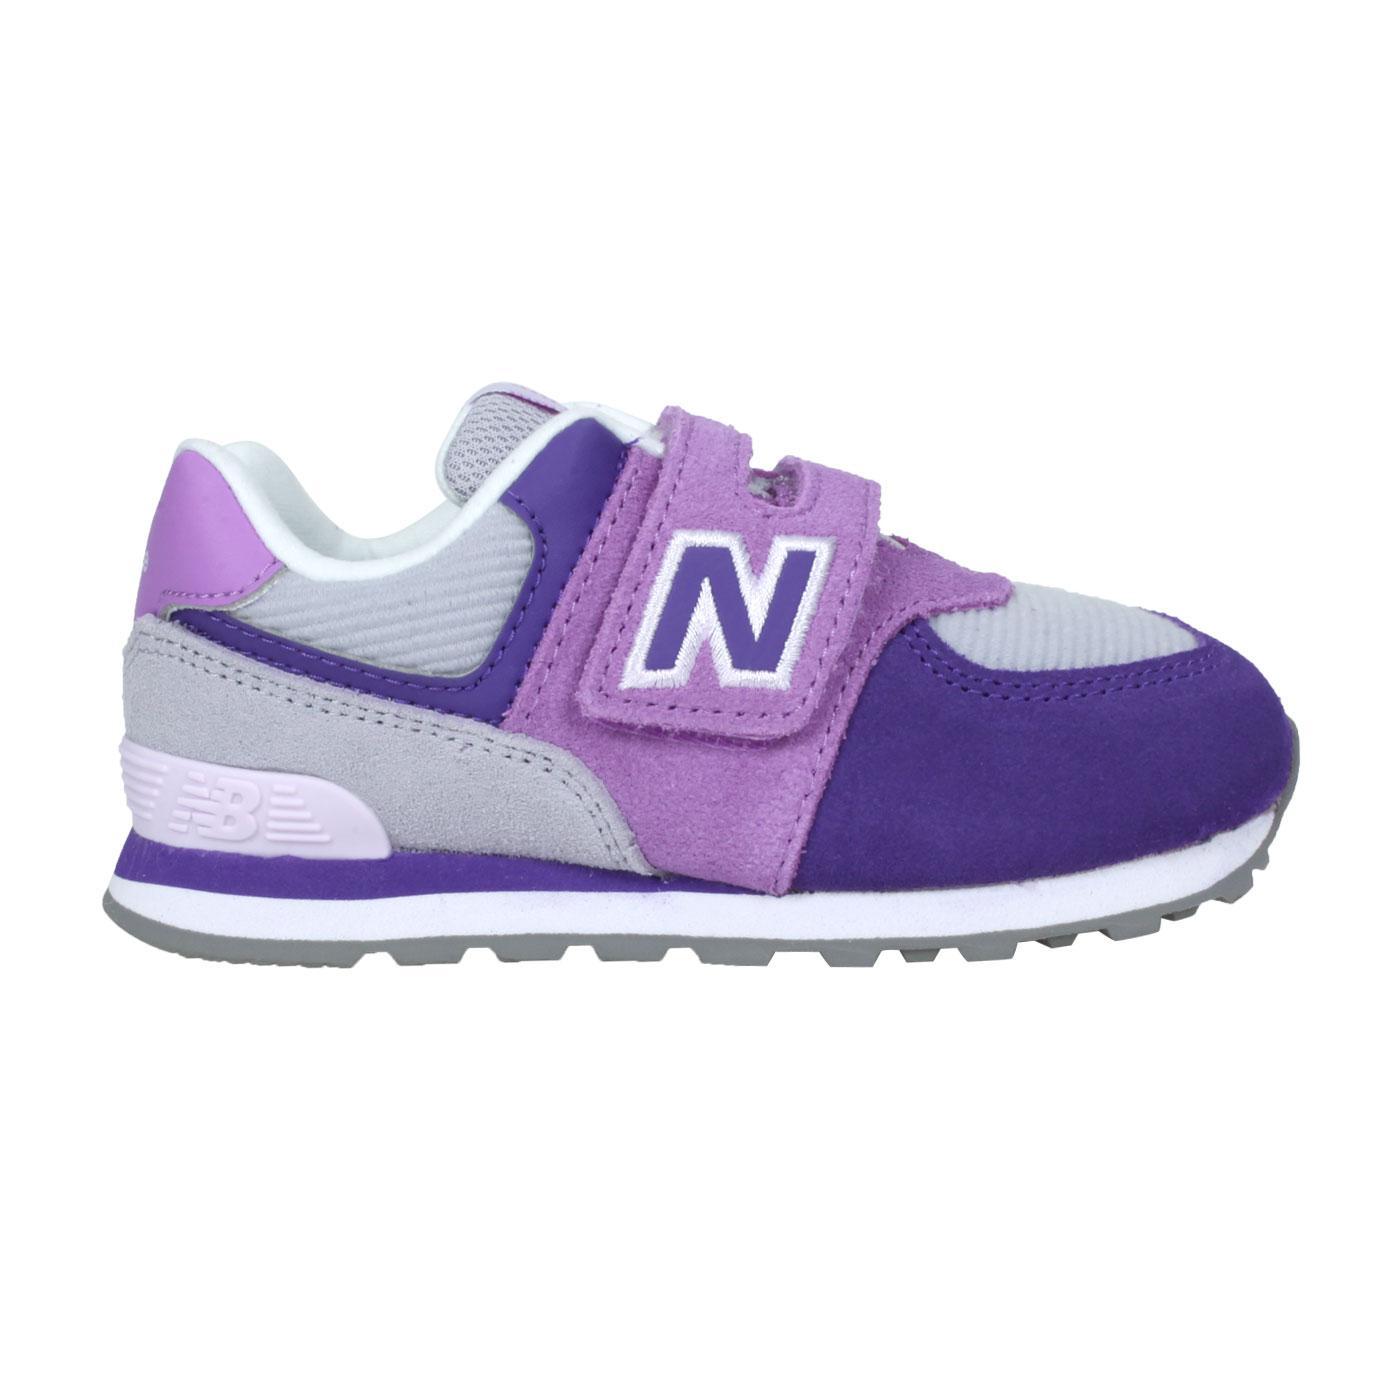 NEW BALANCE 小童休閒運動鞋-WIDE IV574WQ1 - 紫灰